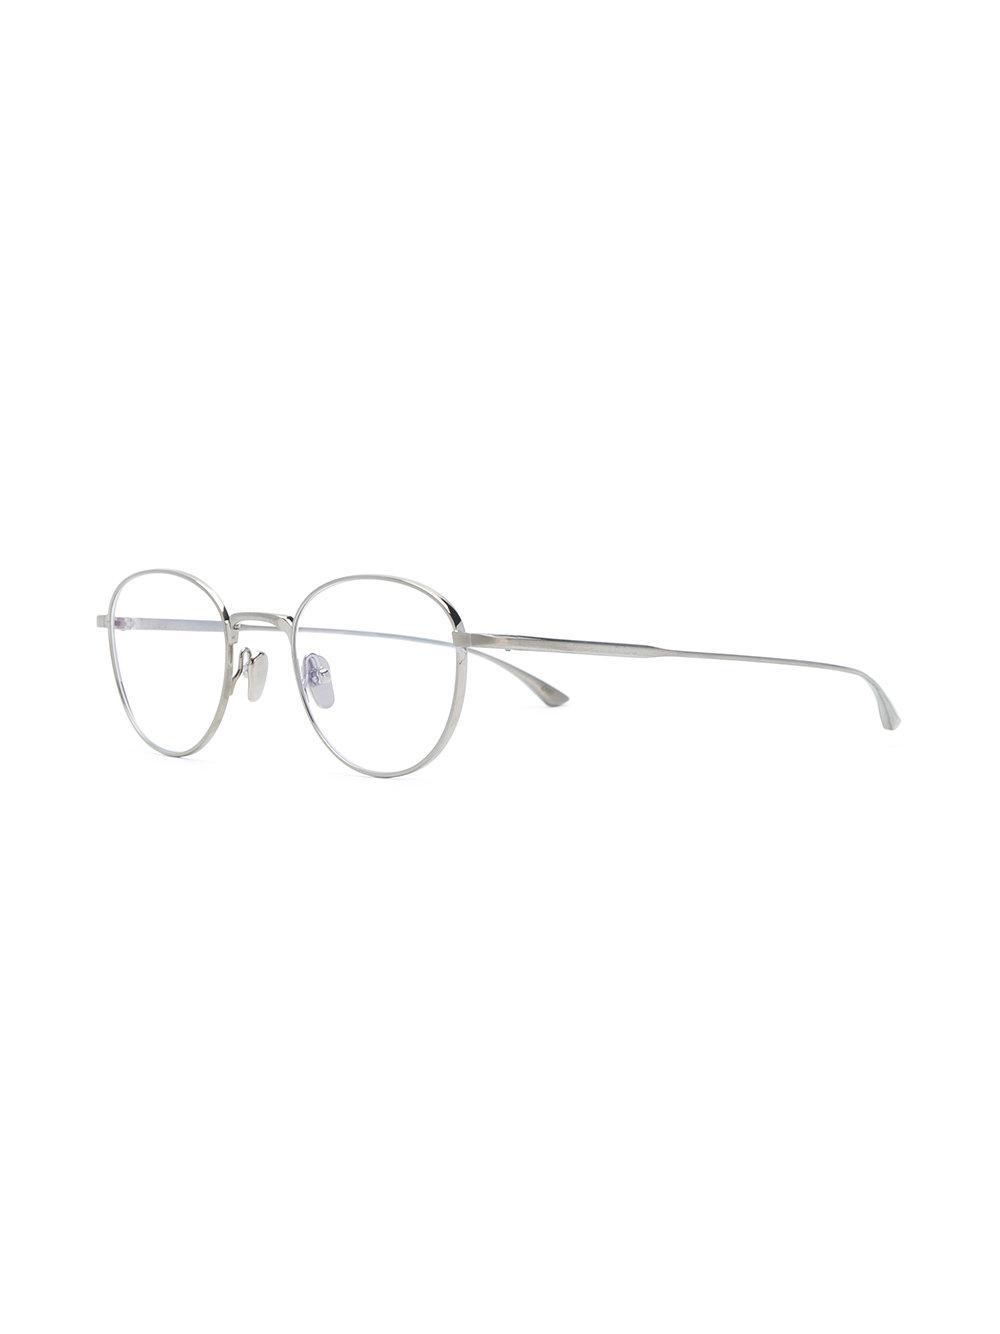 cceec96d7a3 Masunaga Round Frame Glasses in Metallic for Men - Lyst